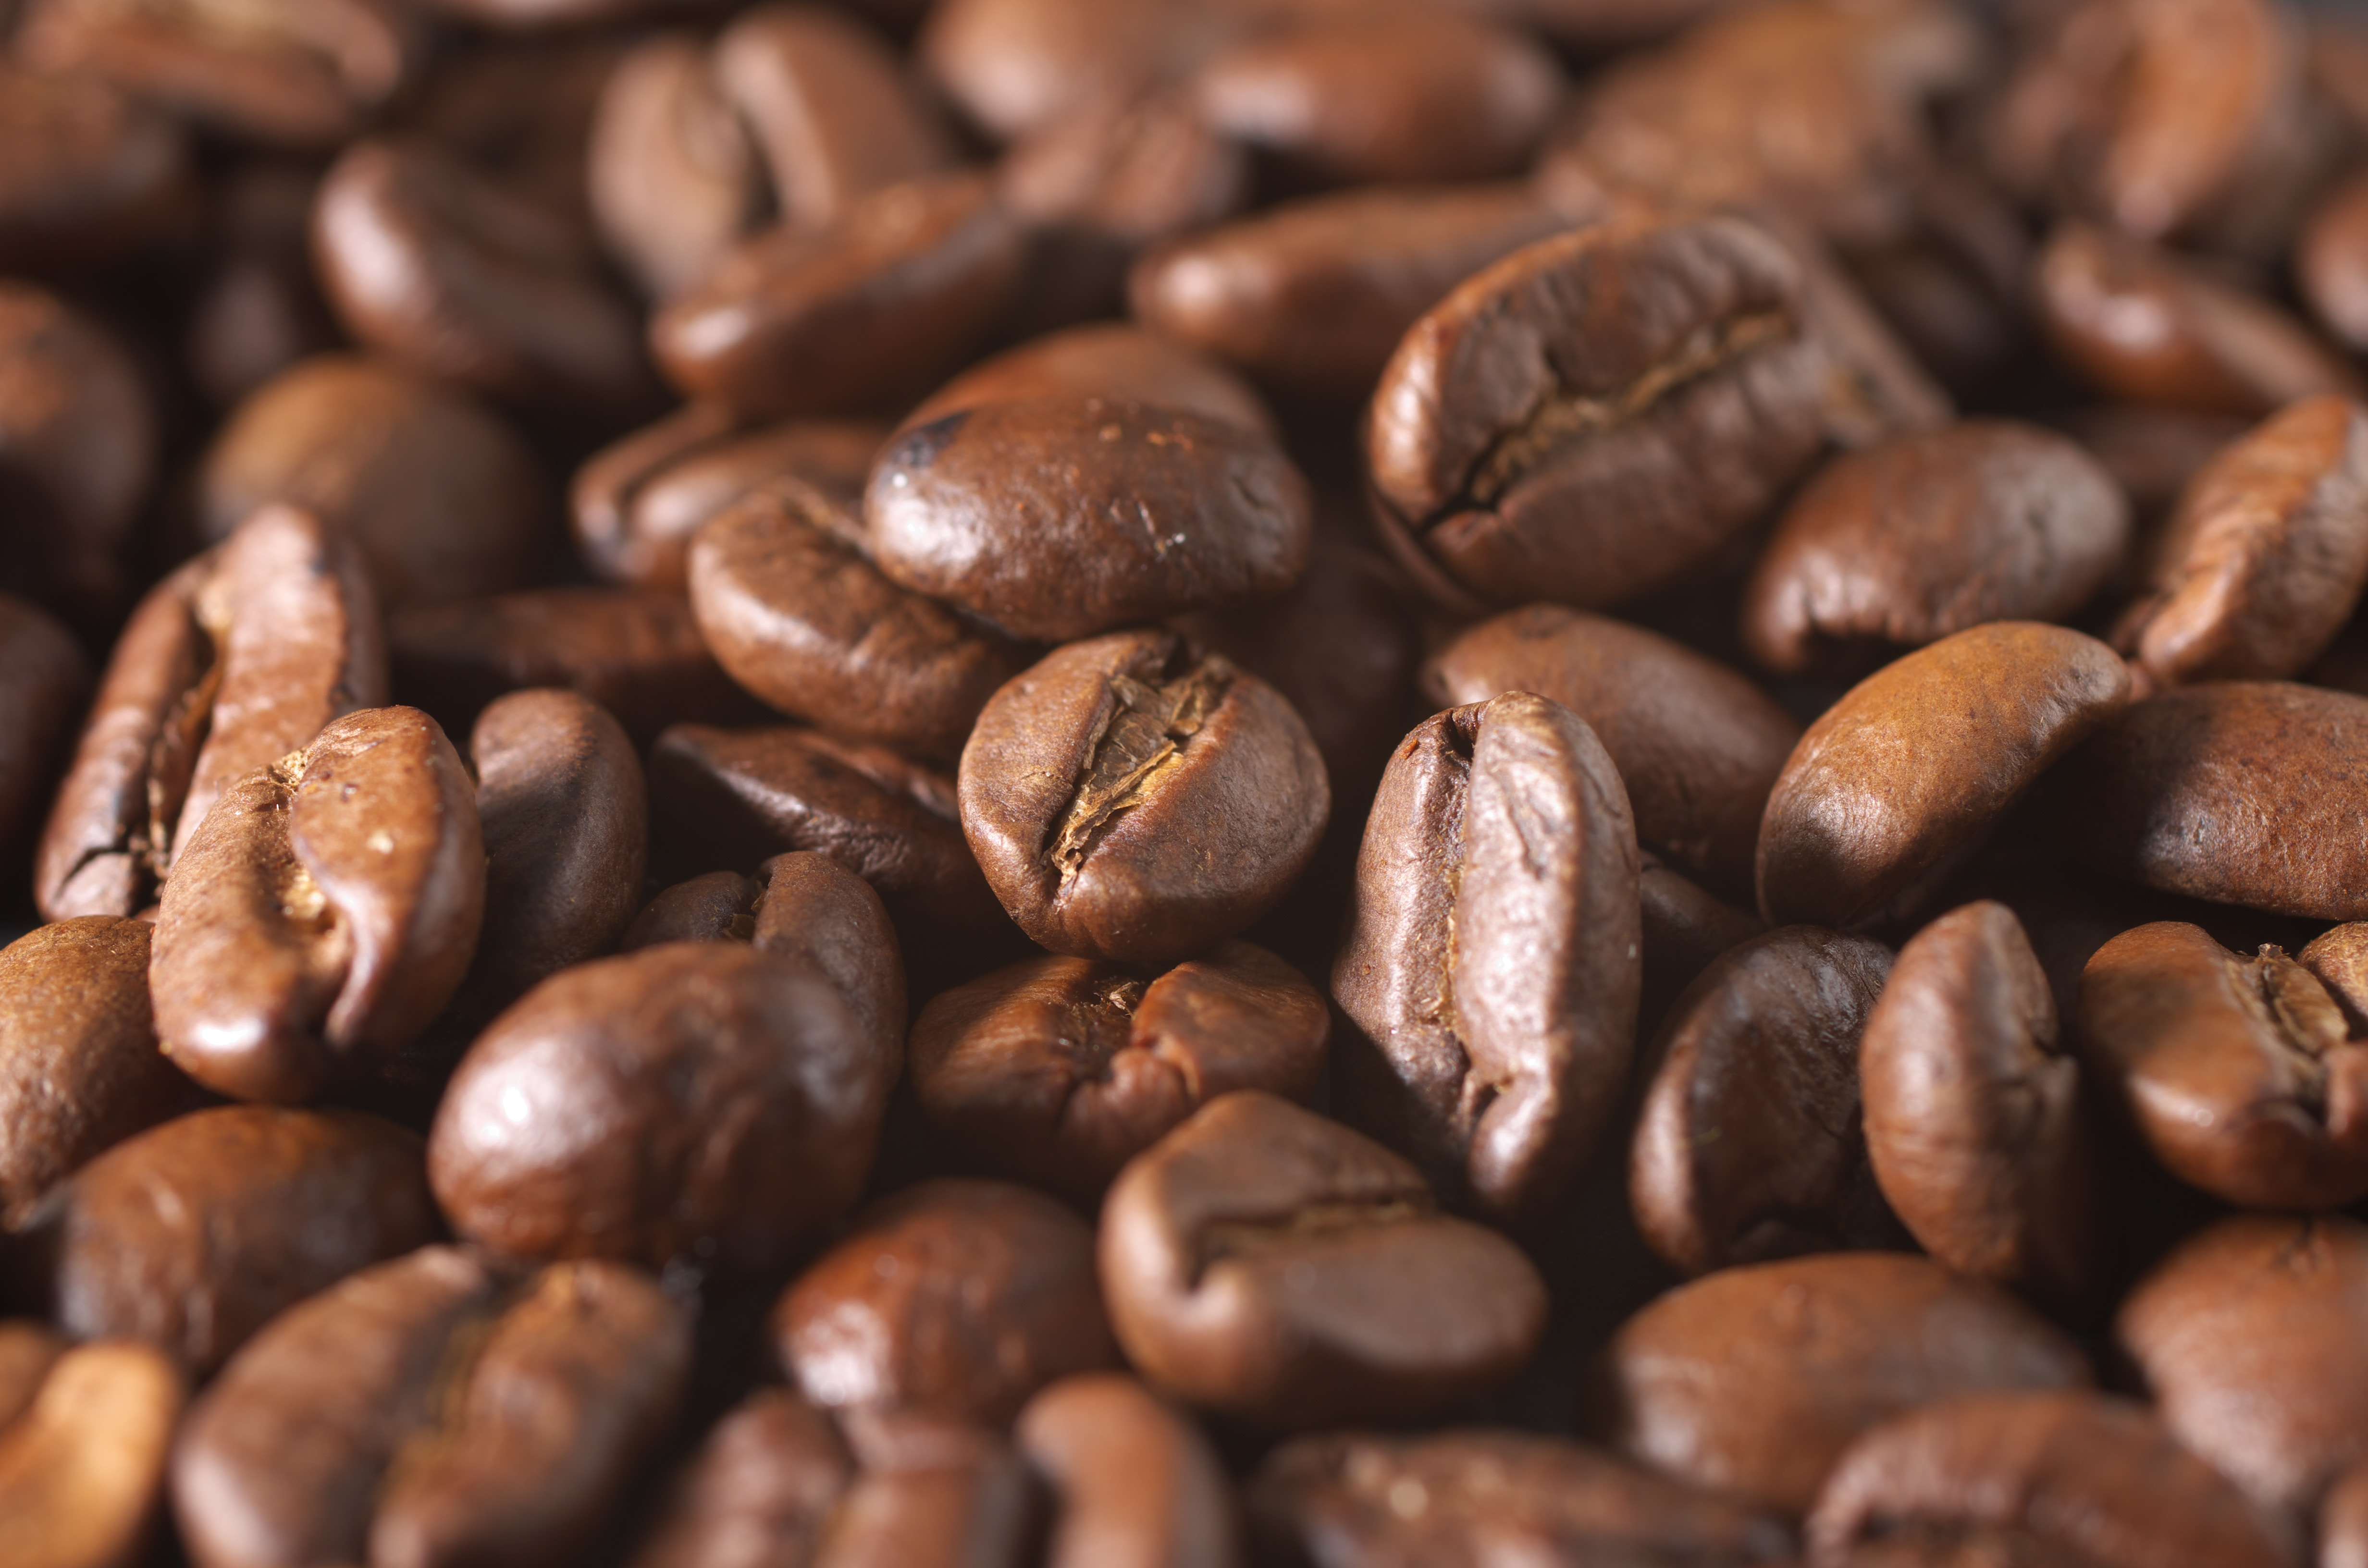 provenance in the international coffee market?